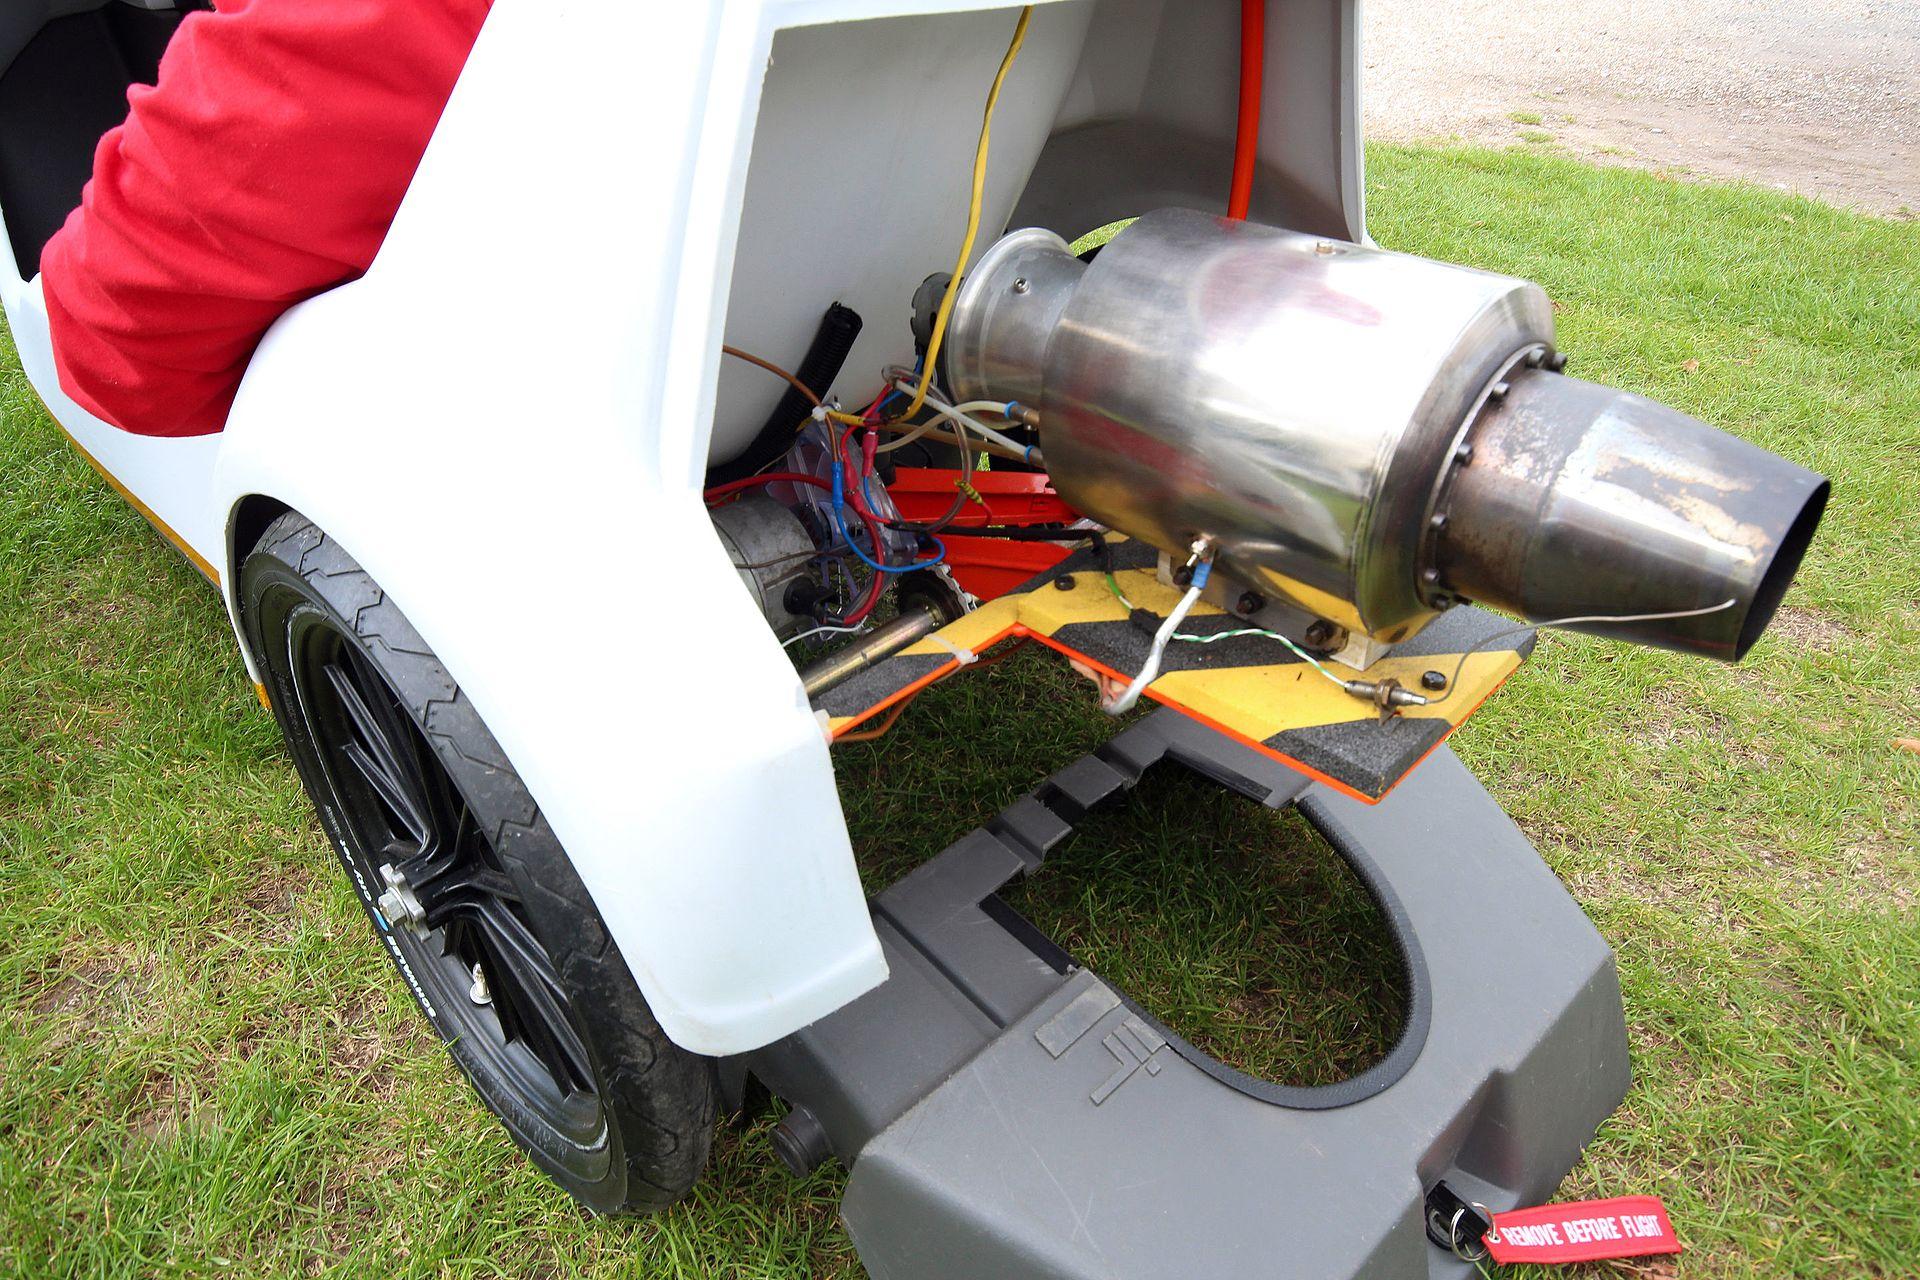 https://upload.wikimedia.org/wikipedia/commons/thumb/4/40/Sinclair_C5_jet_engine.jpg/1920px-Sinclair_C5_jet_engine.jpg